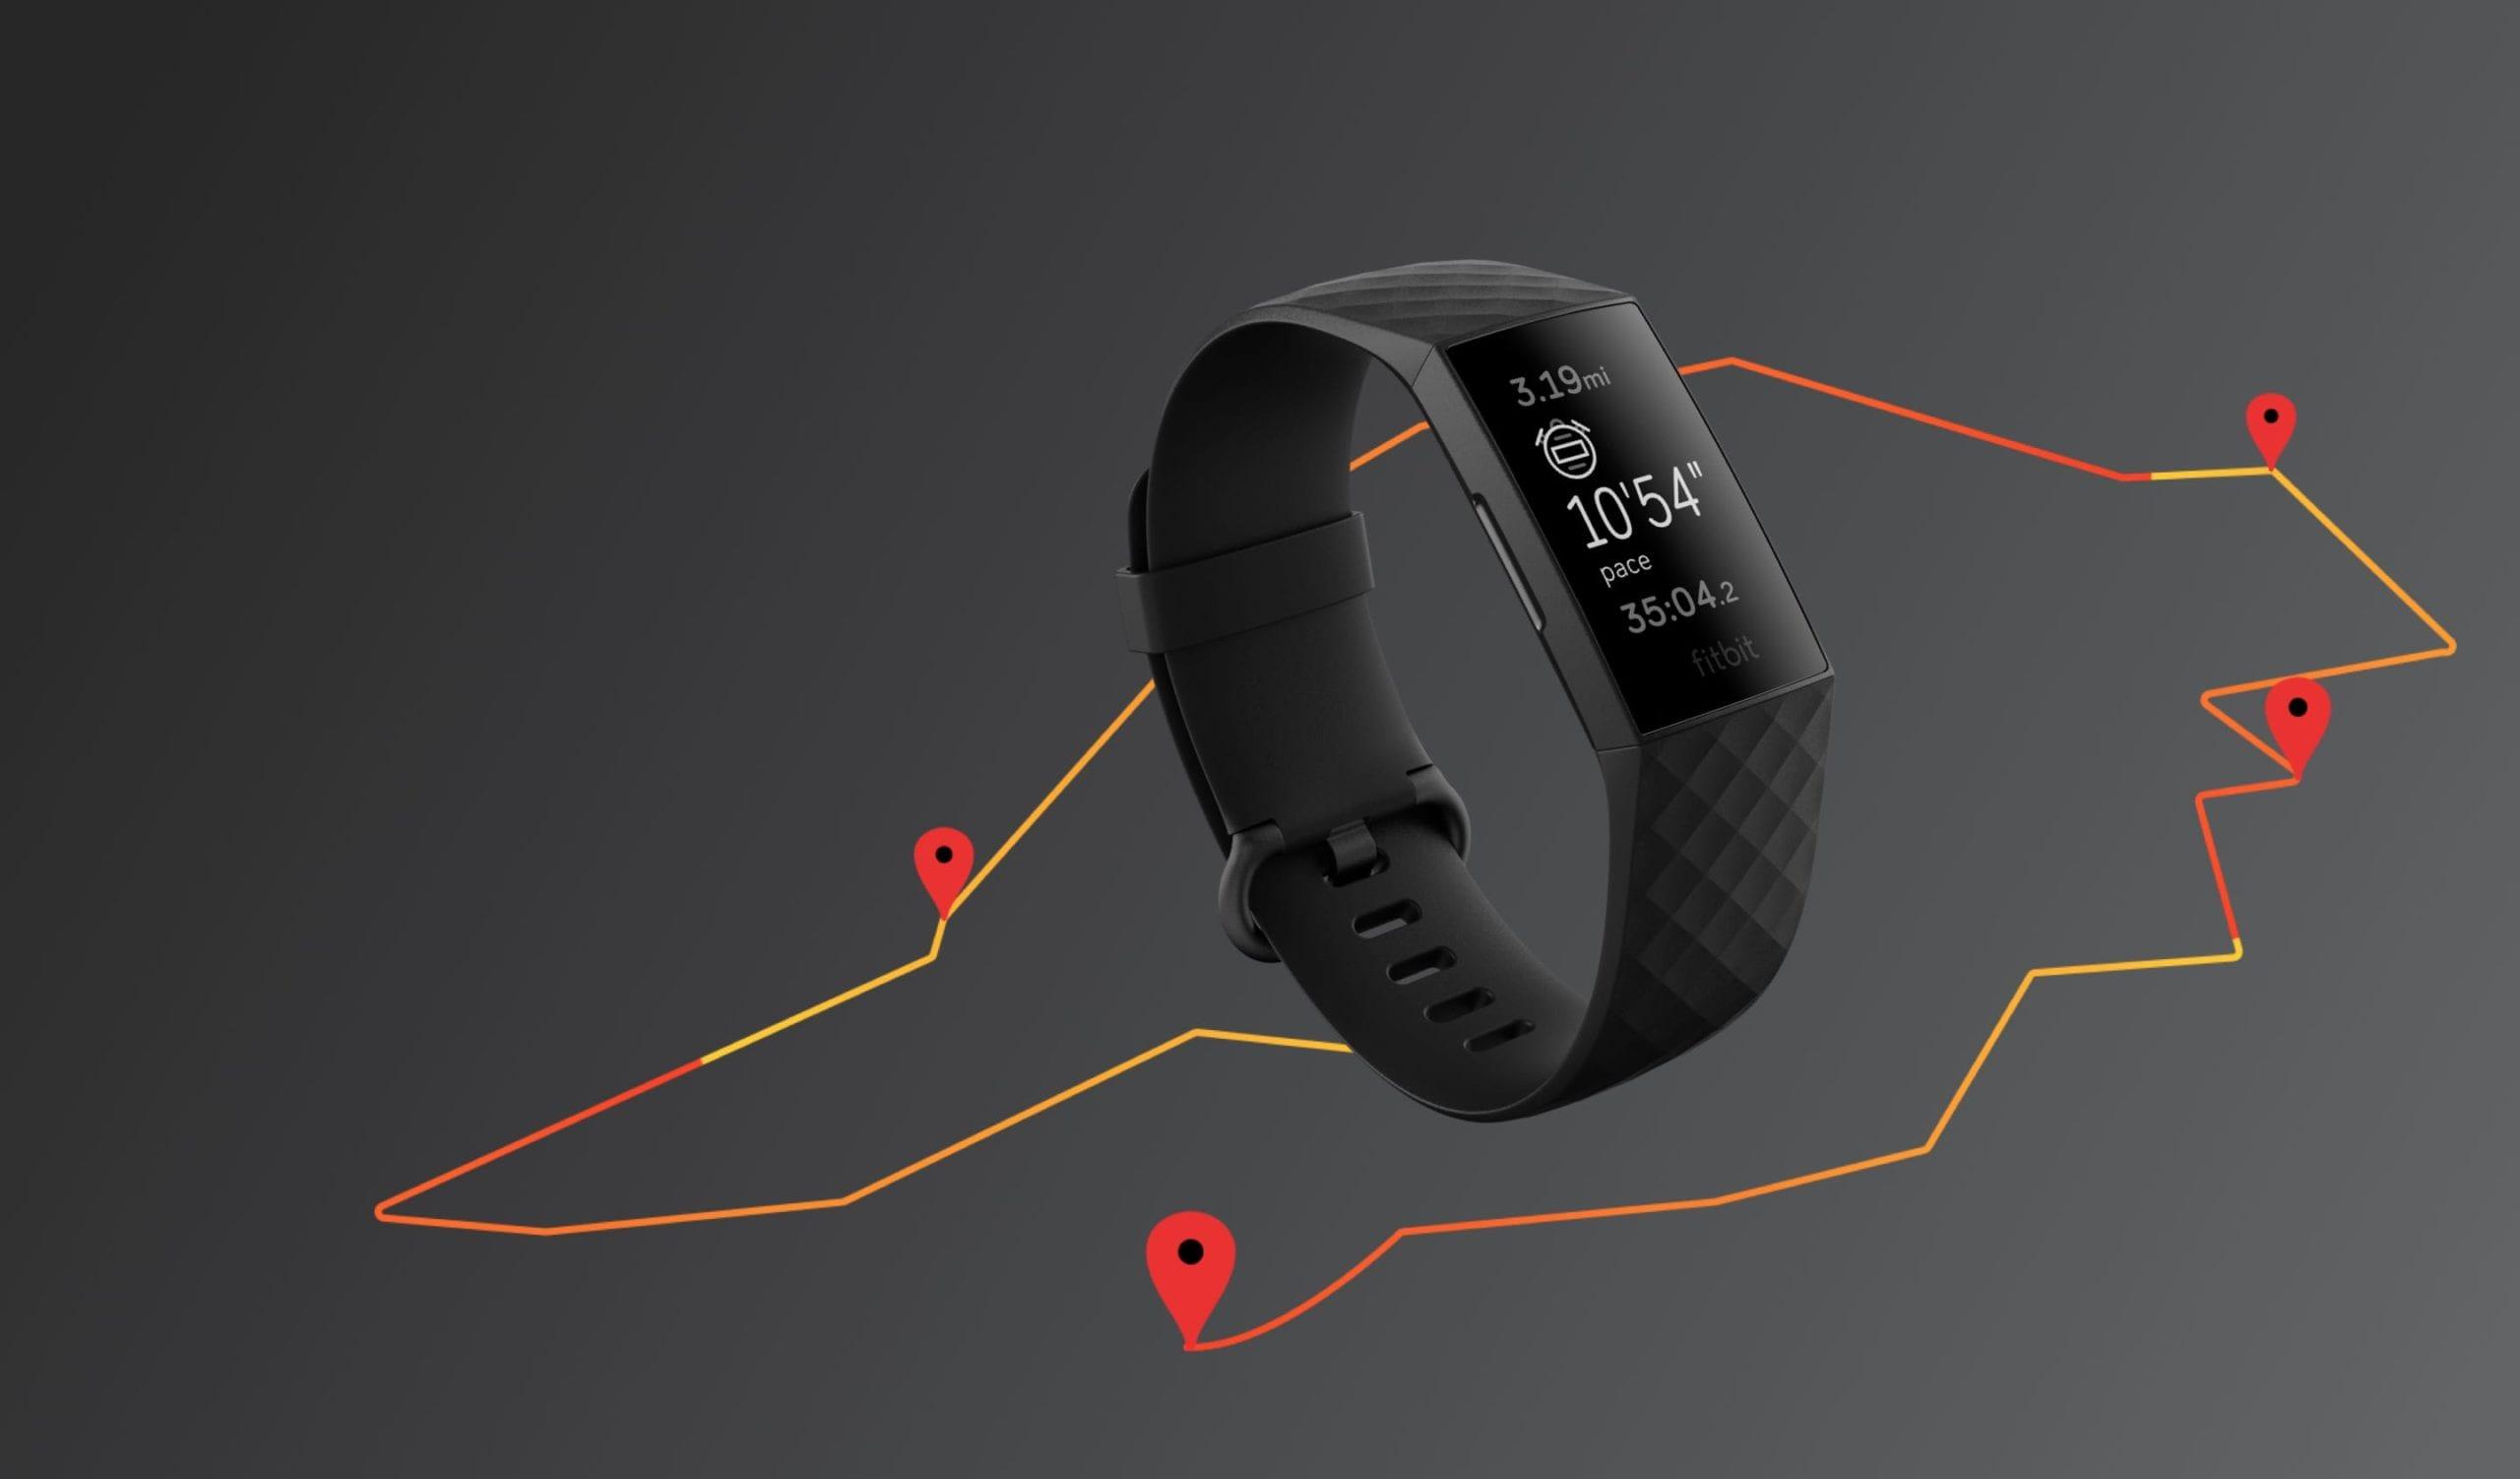 Cómo reiniciar y encender Fitbit Charge 4